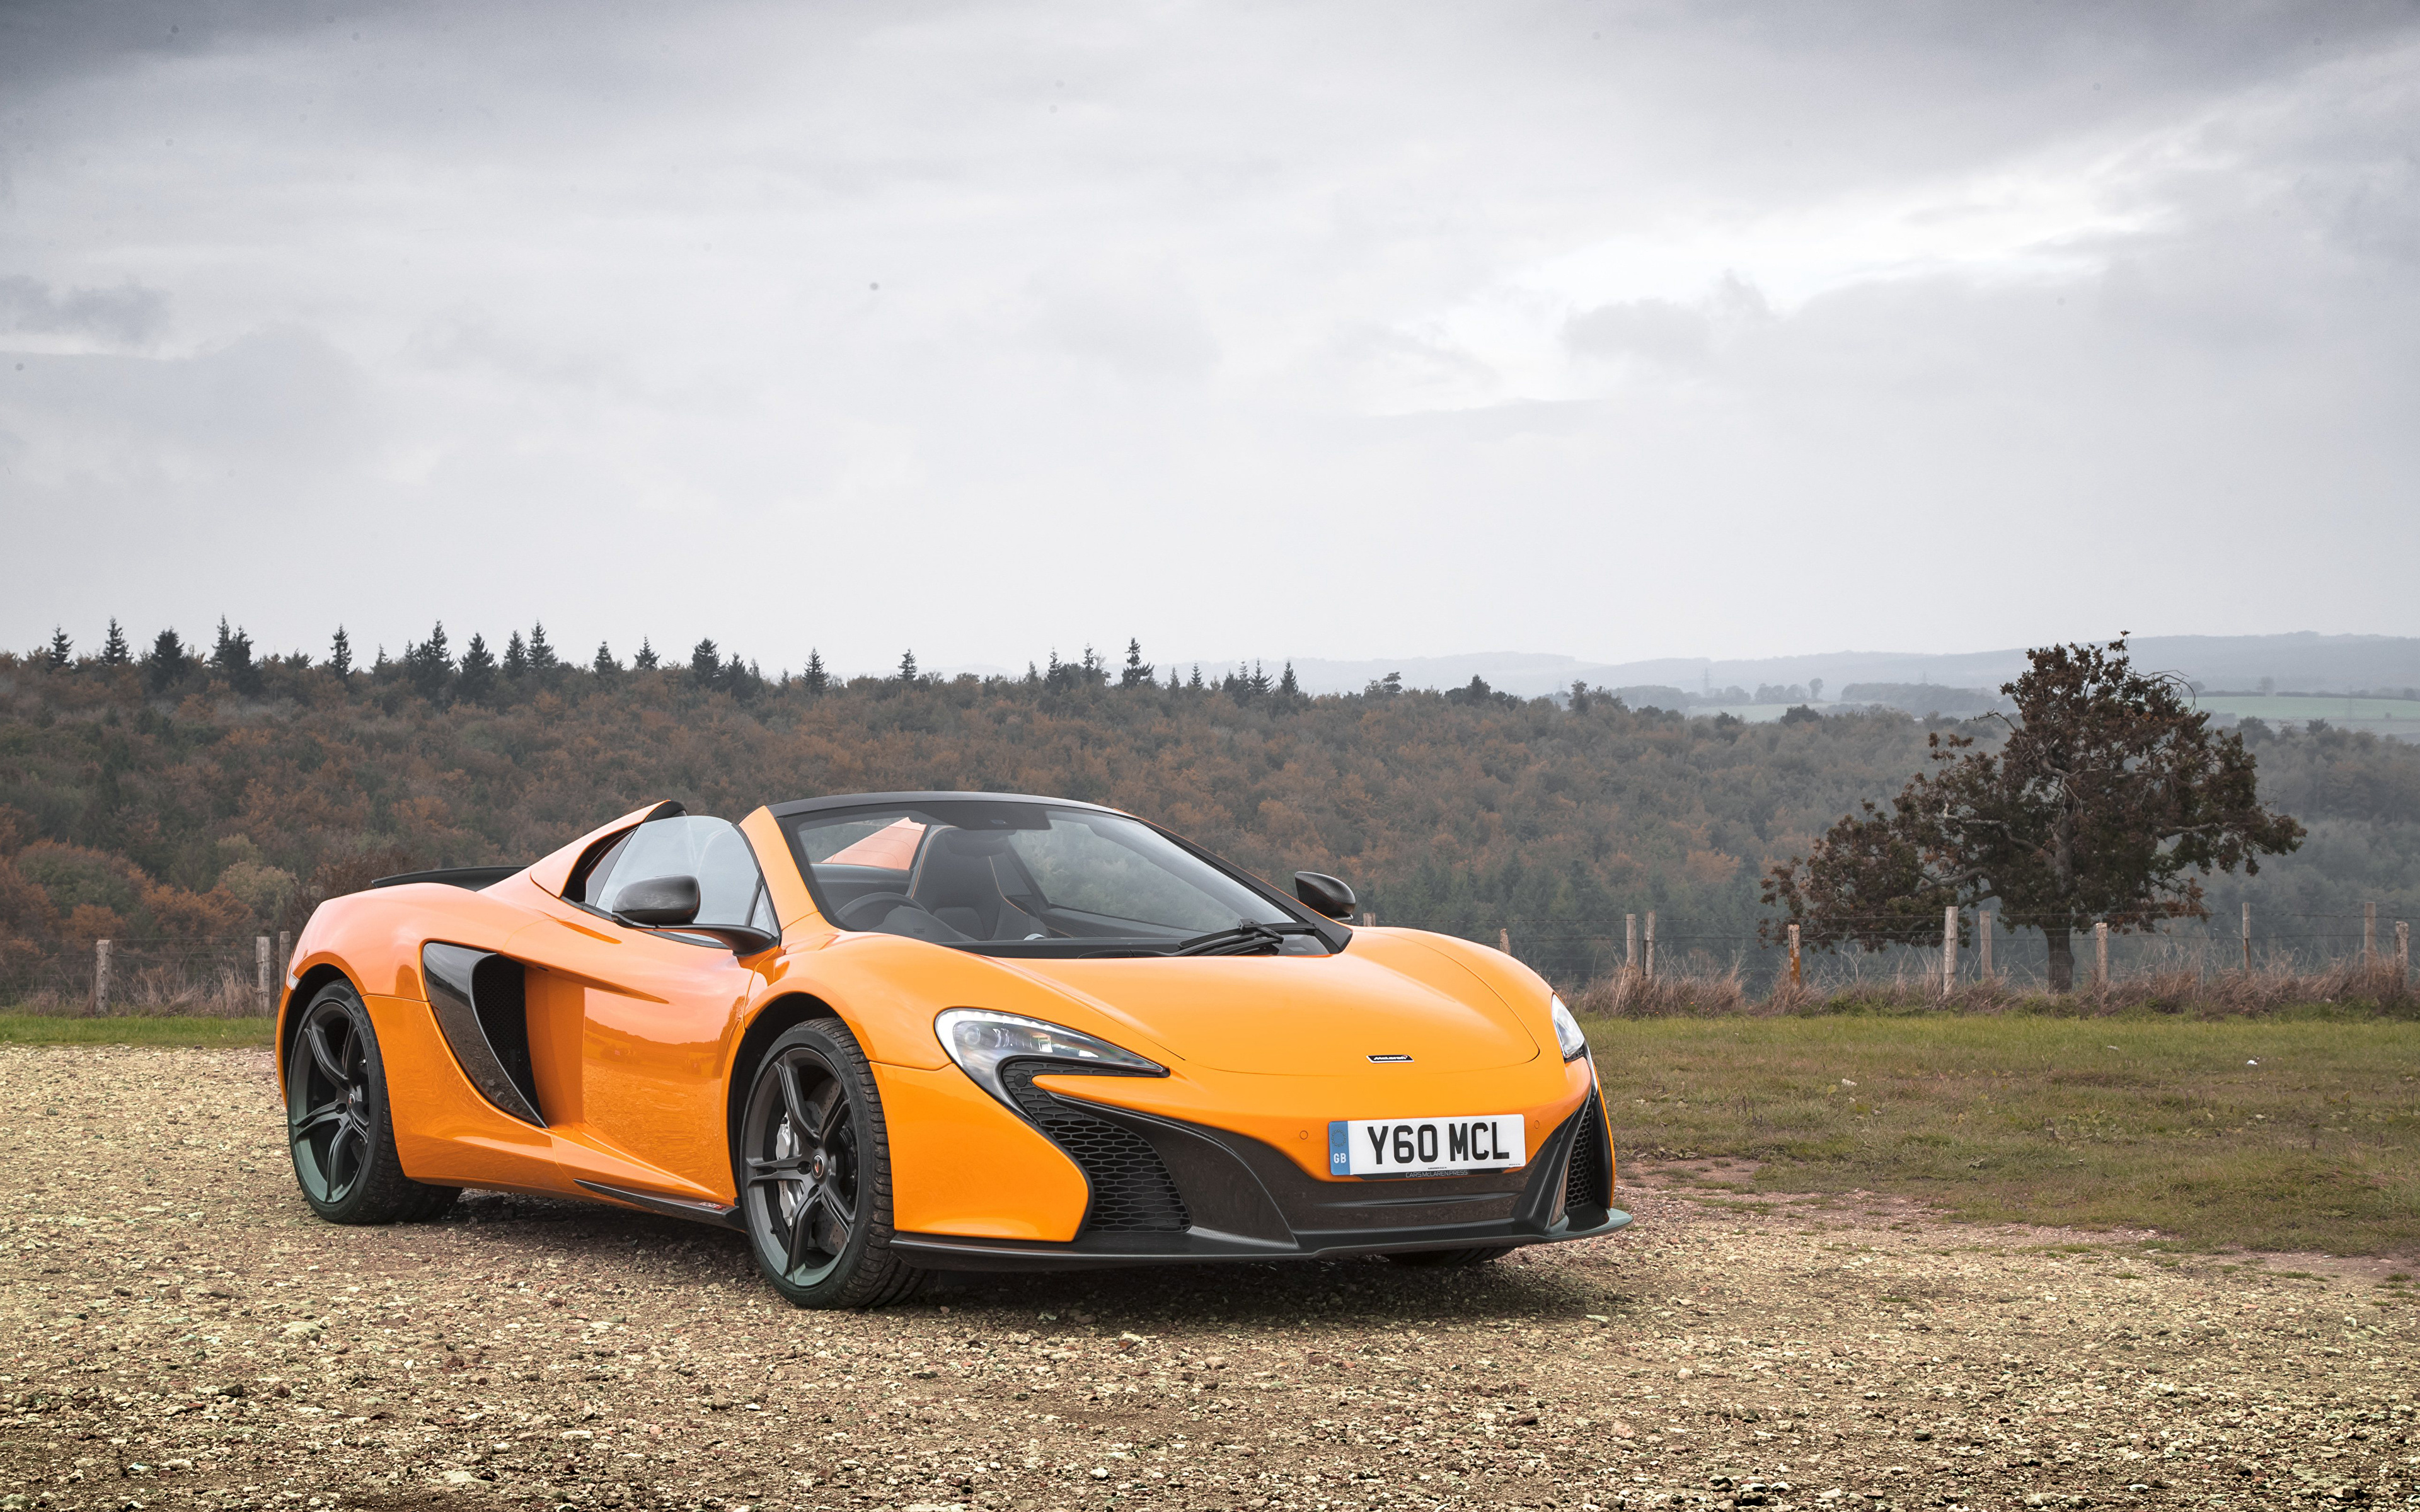 Обои McLaren 2014-16 650S Spyder Родстер желтая Металлик Автомобили 3840x2400 Макларен желтых желтые Желтый Авто Машины